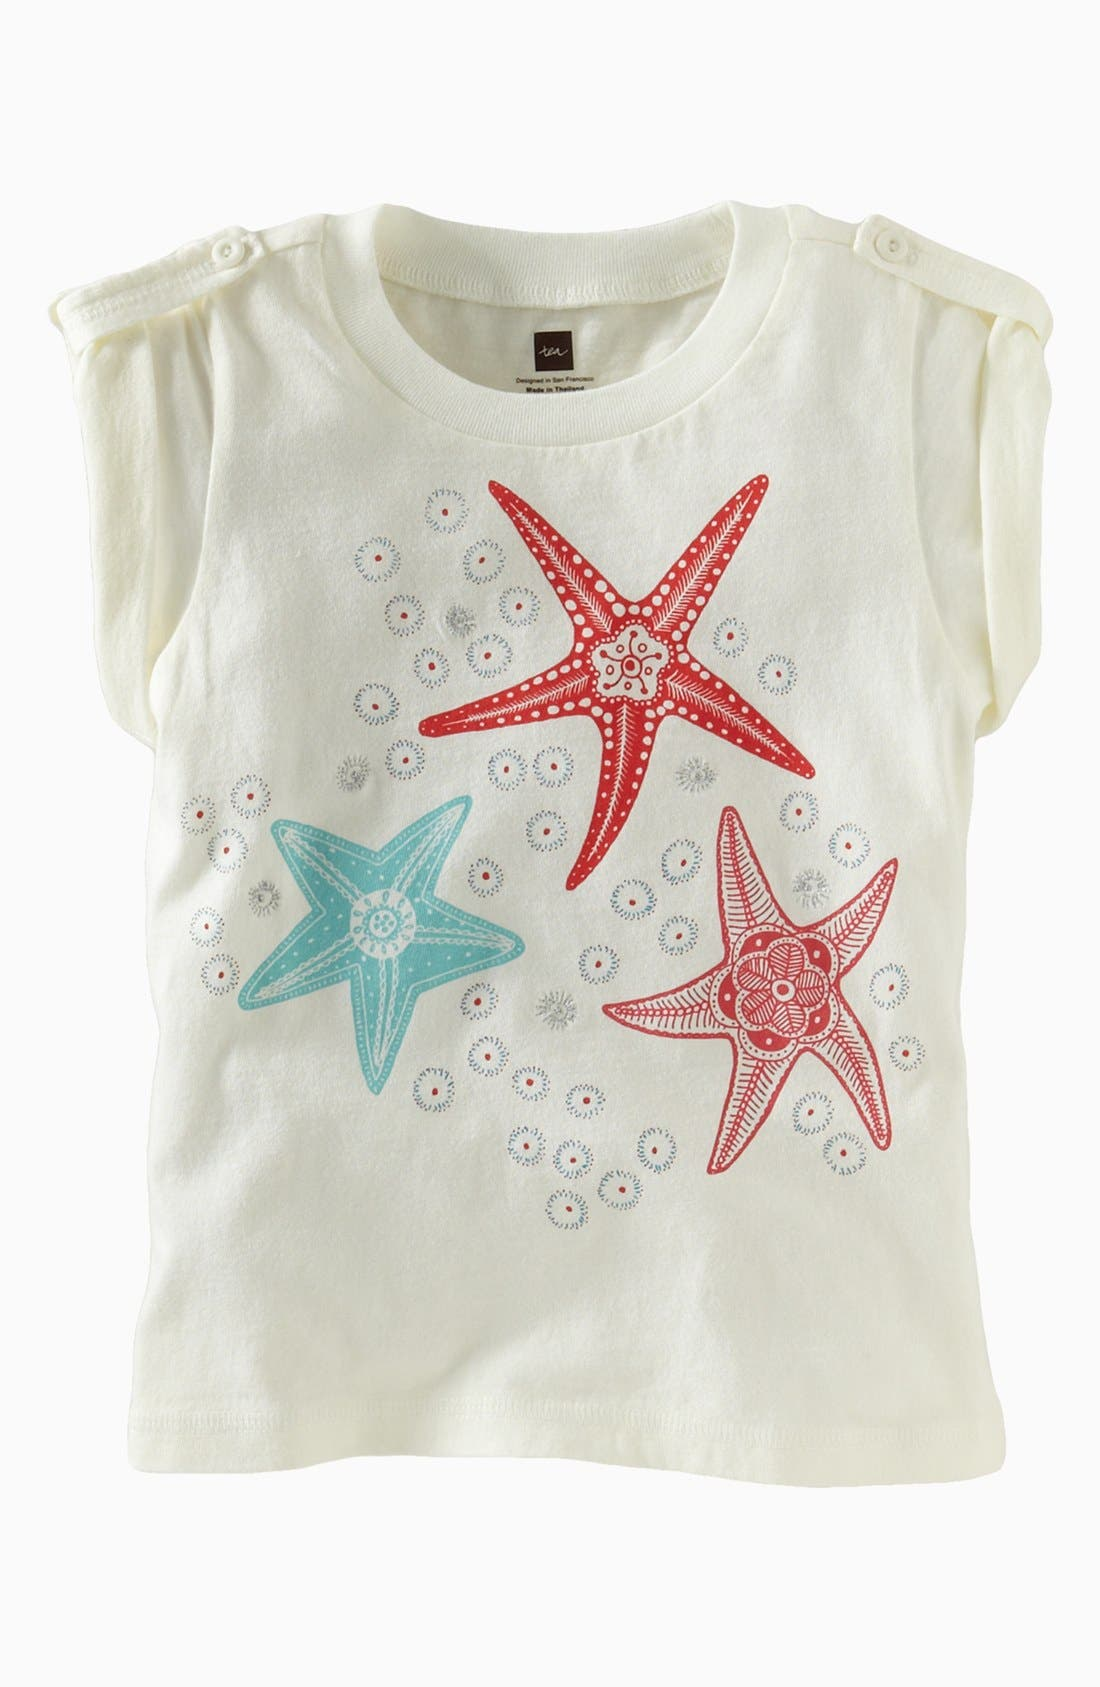 Alternate Image 1 Selected - Tea Collection 'Sea Star' Tee (Little Girls & Big Girls)